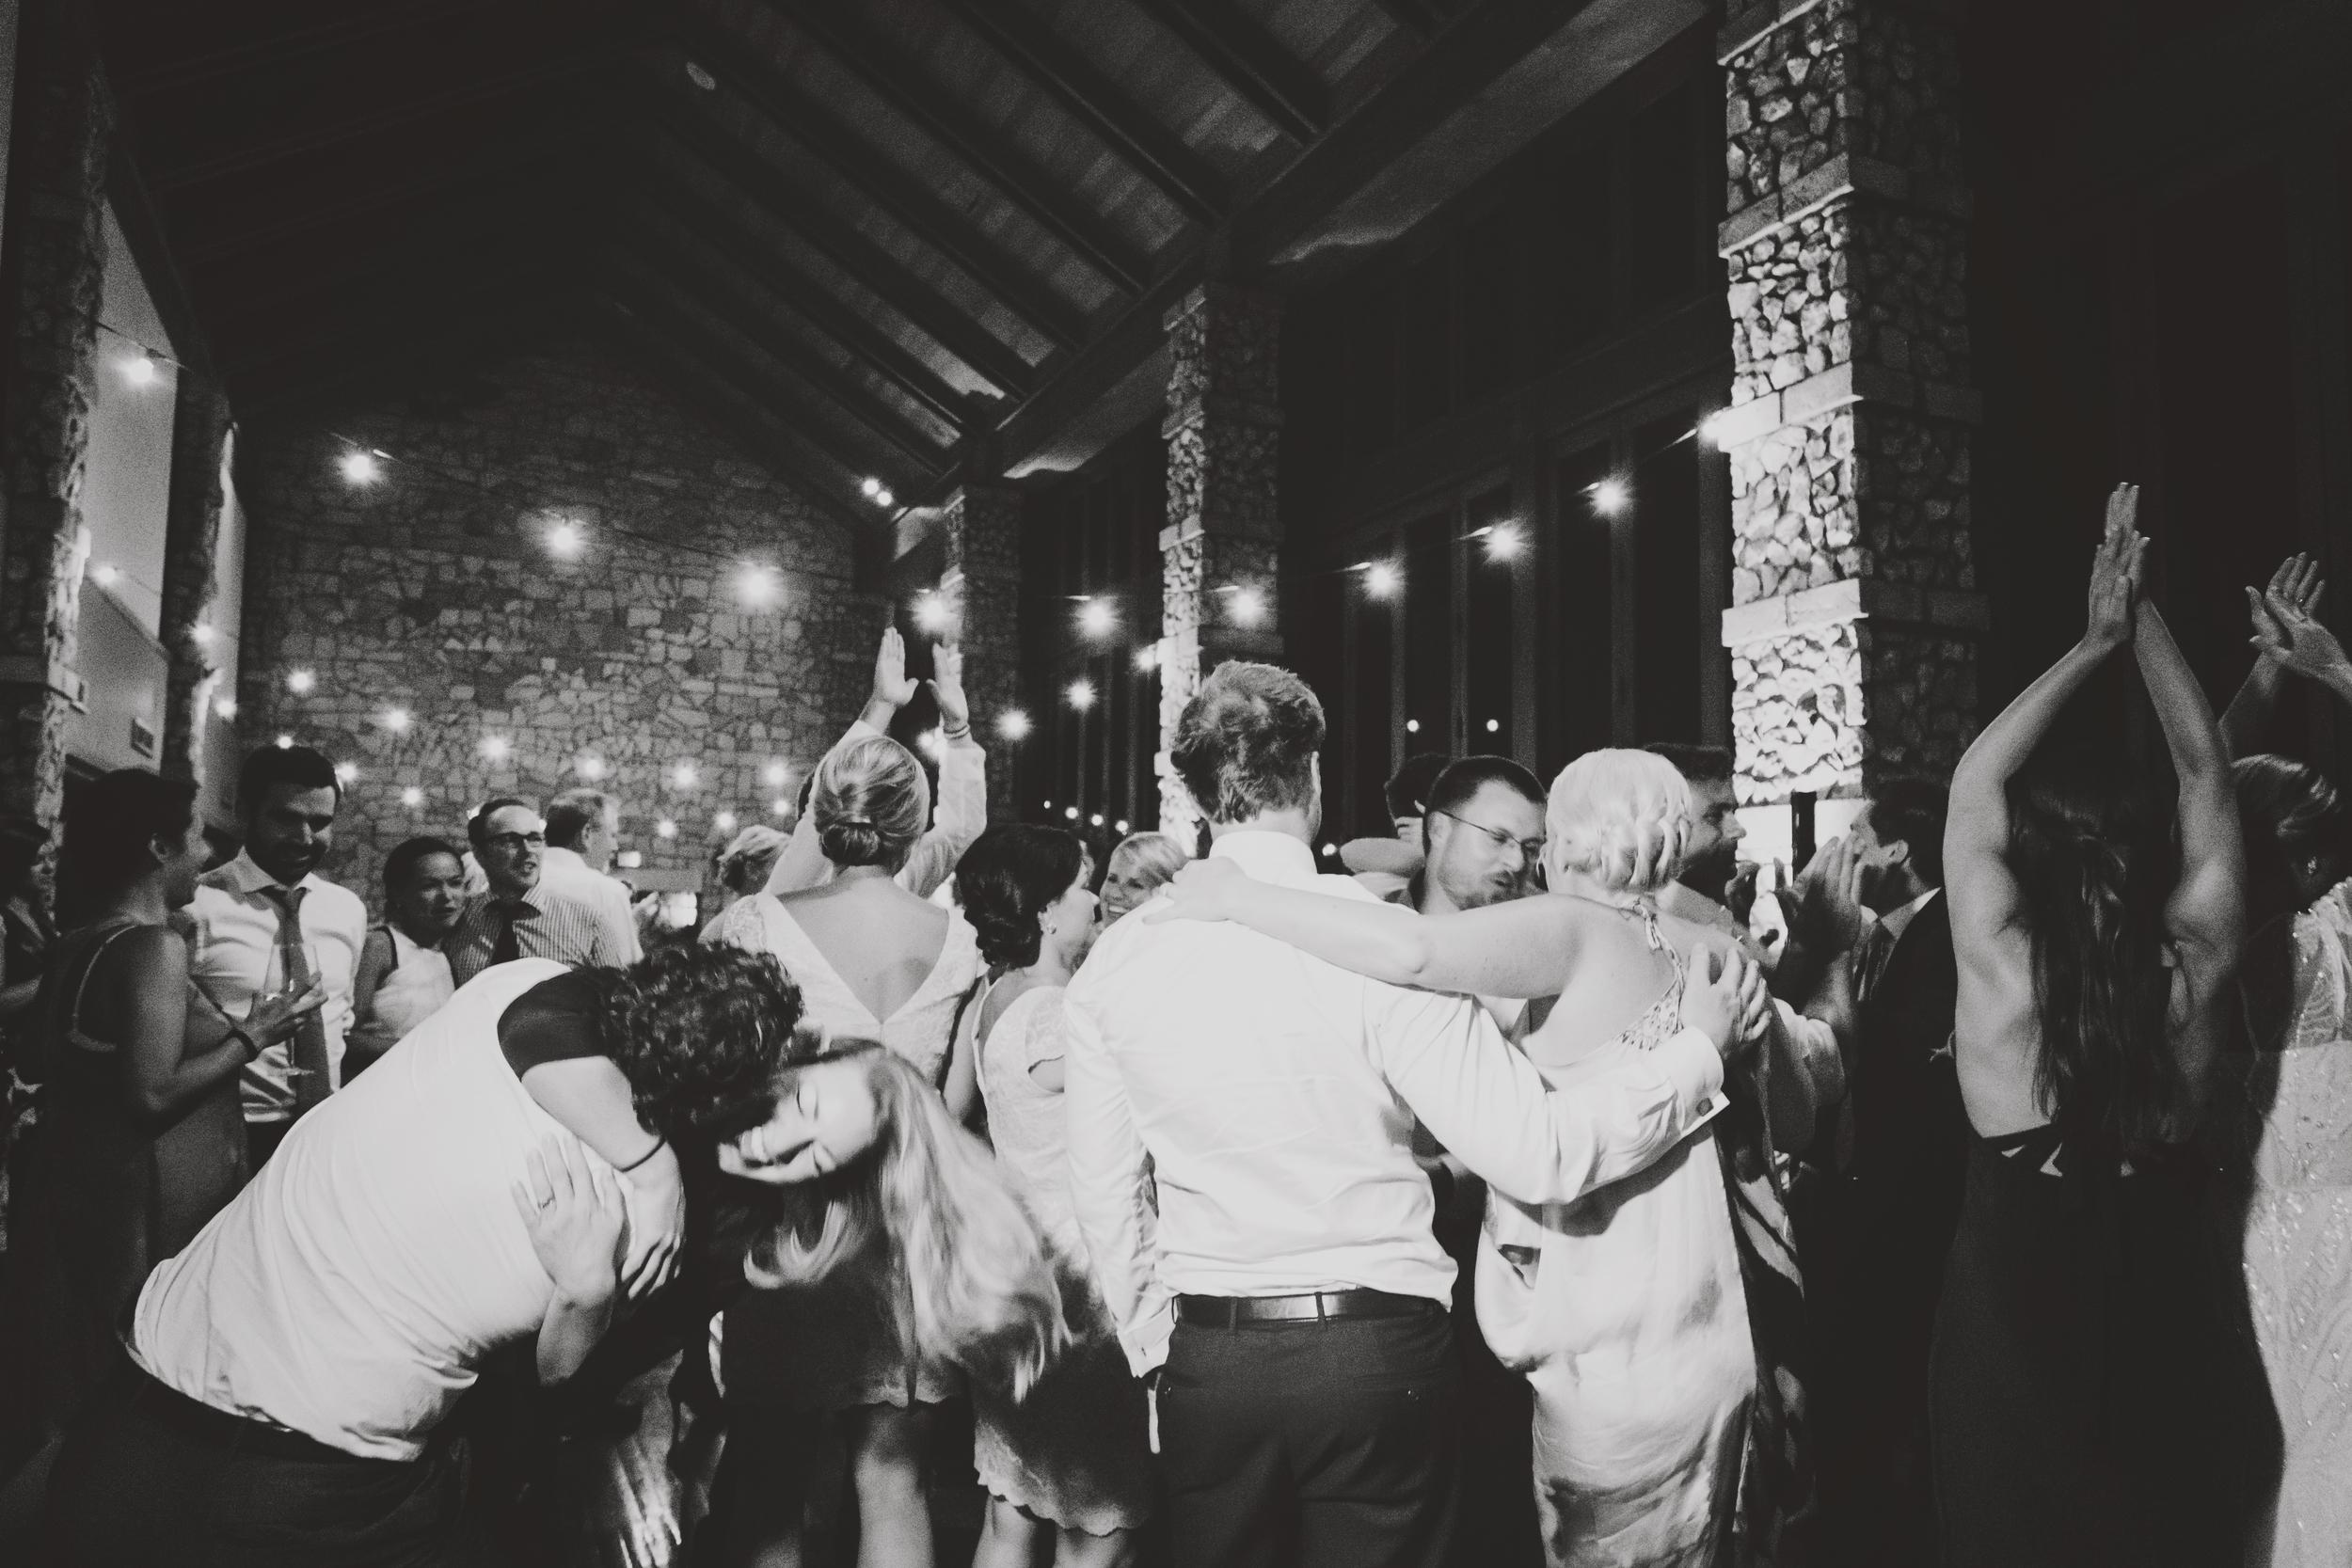 angie-diaz-photography-maui-wedding-mel-matt-114.jpg